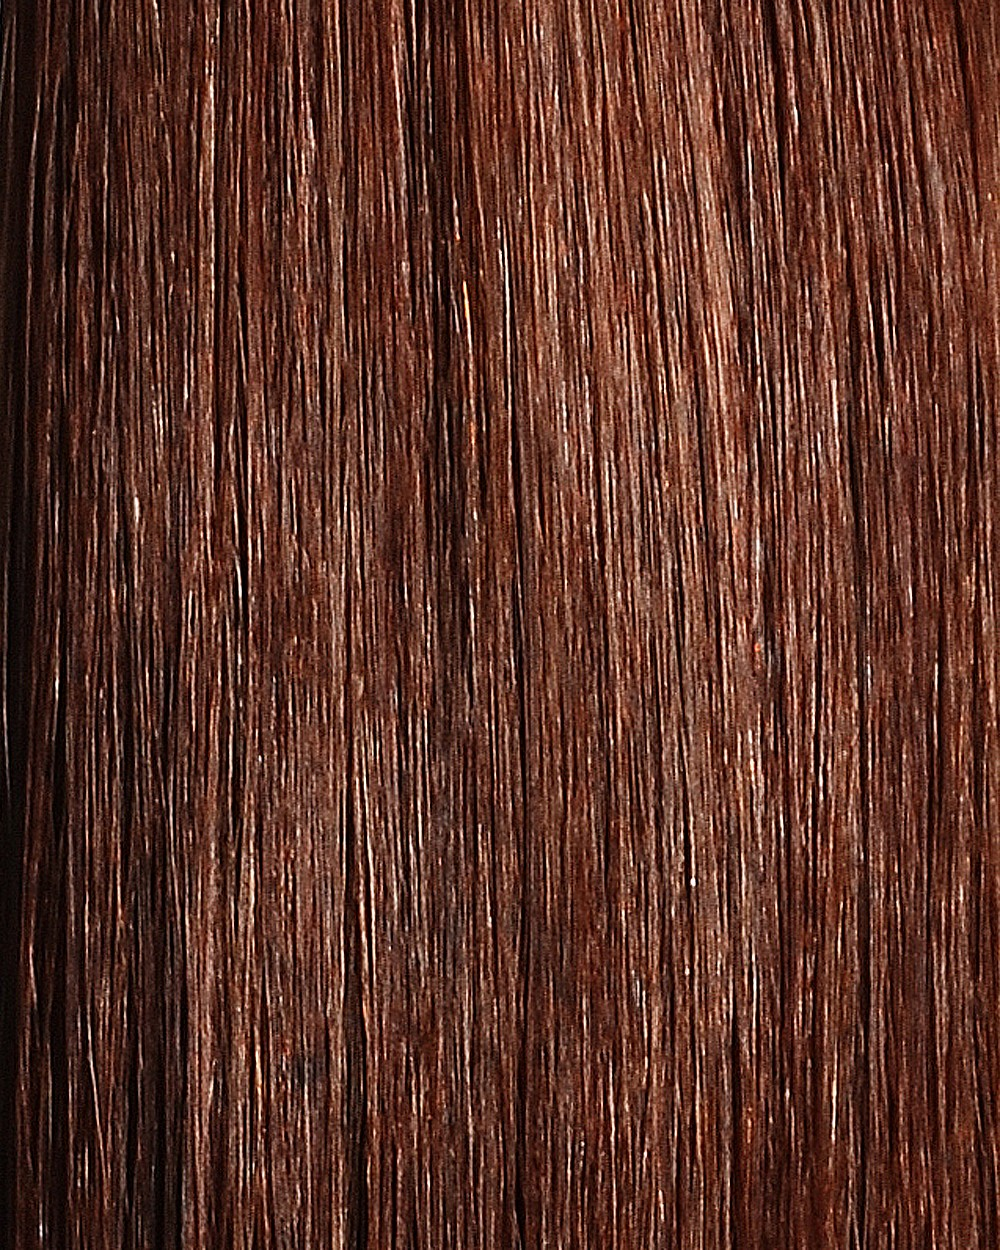 Copper Auburn Mix (30-33)